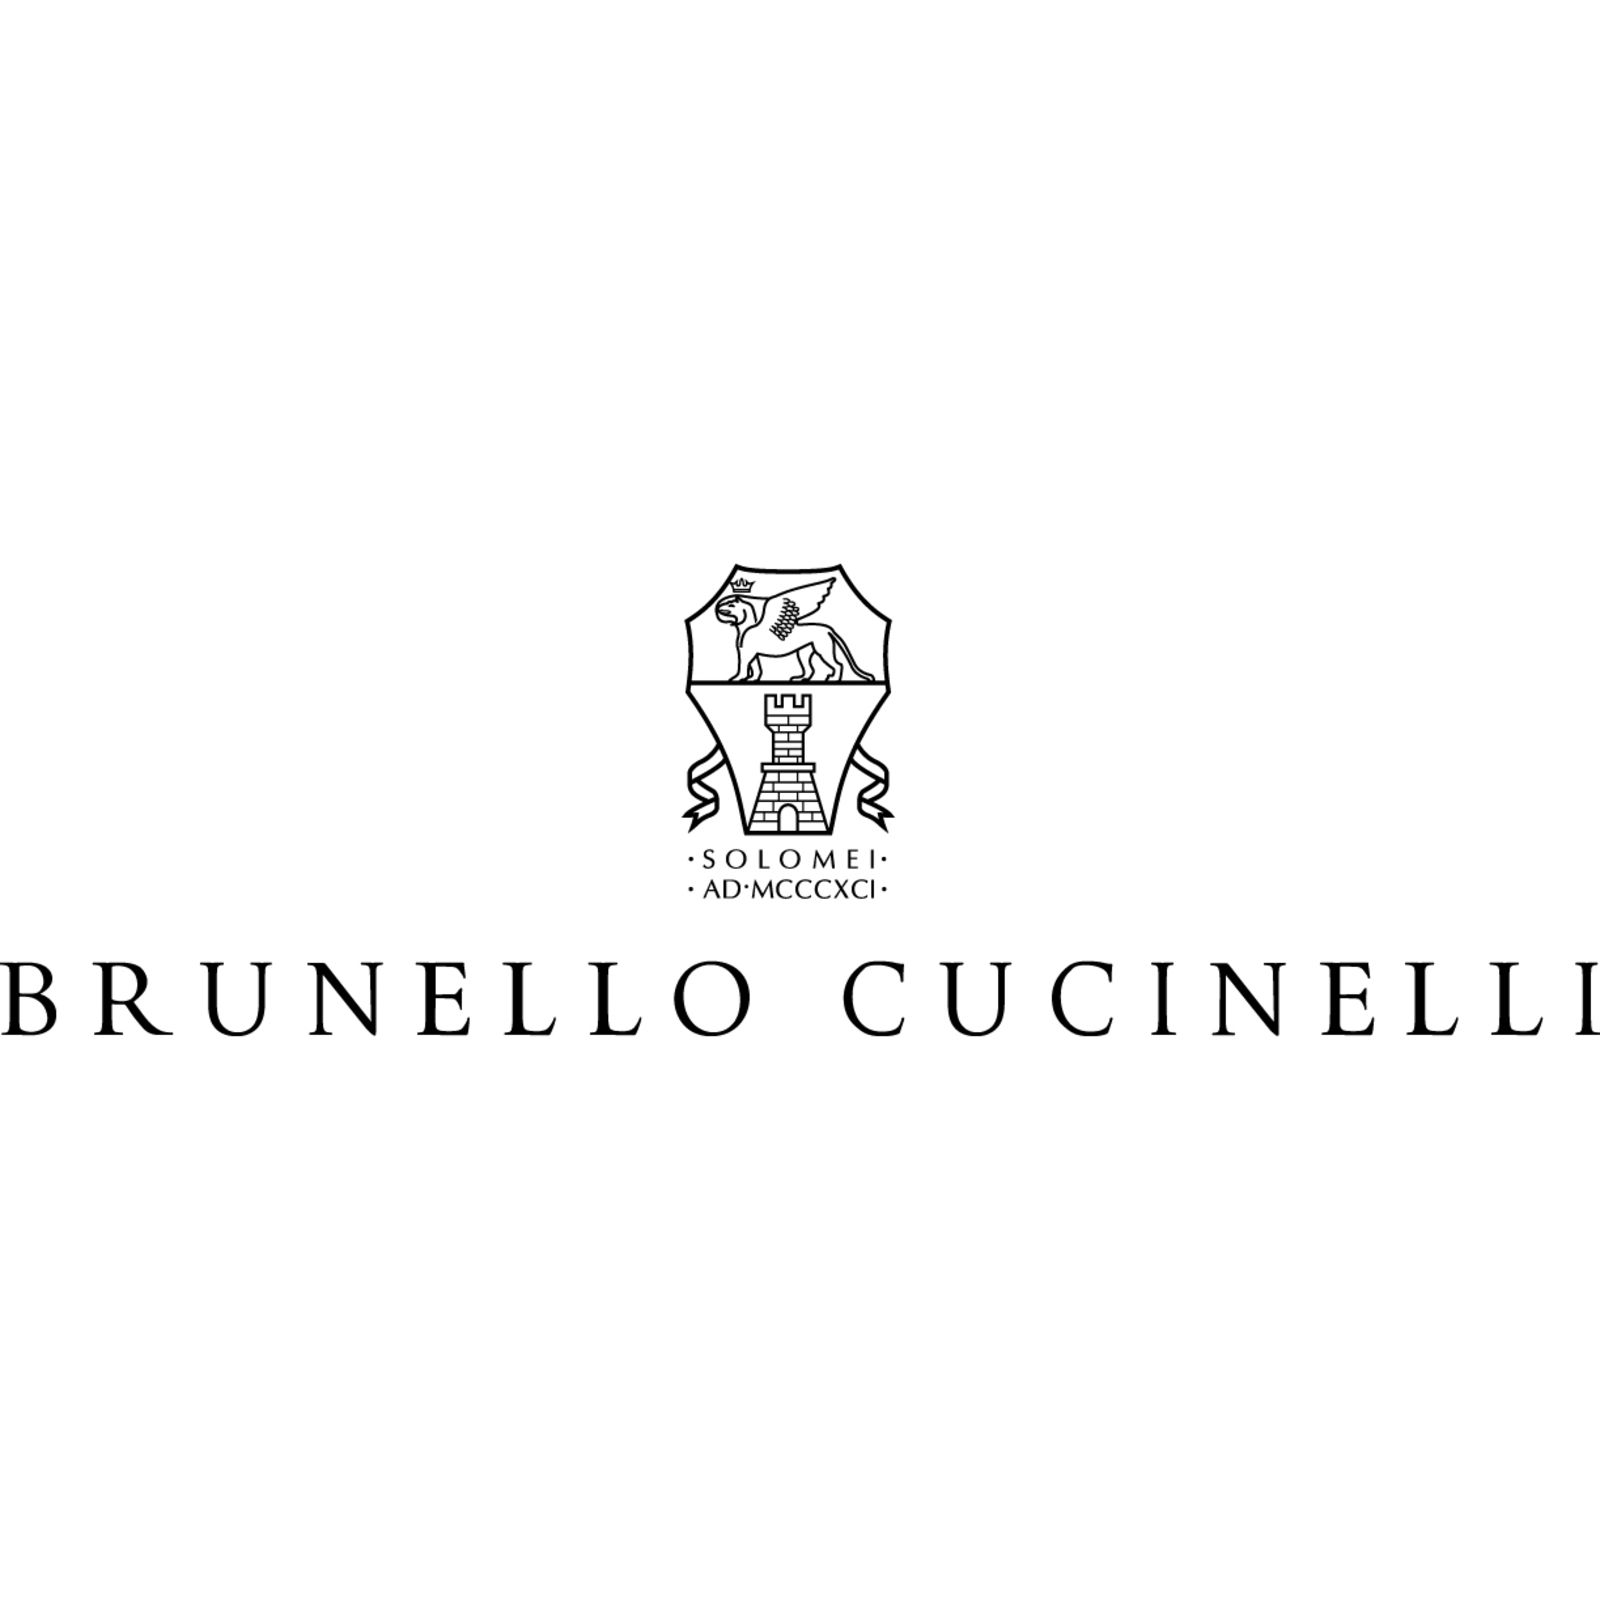 BRUNELLO CUCINELLI (Image 1)